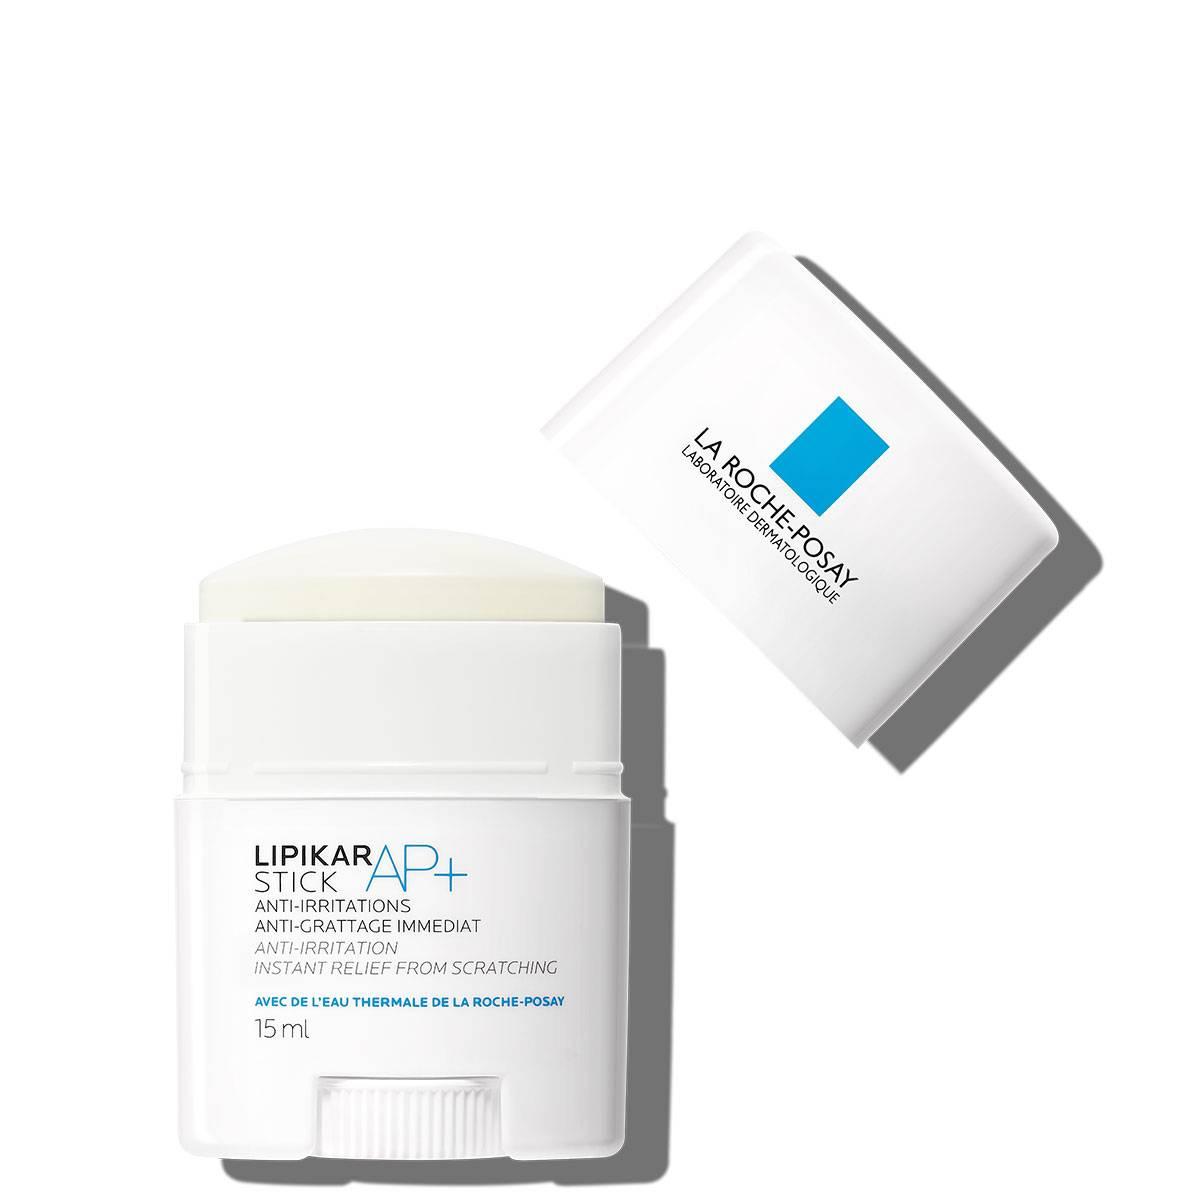 La Roche Posay ProductPage Eczema Lipikar Stick AP 15ml 3337875566254